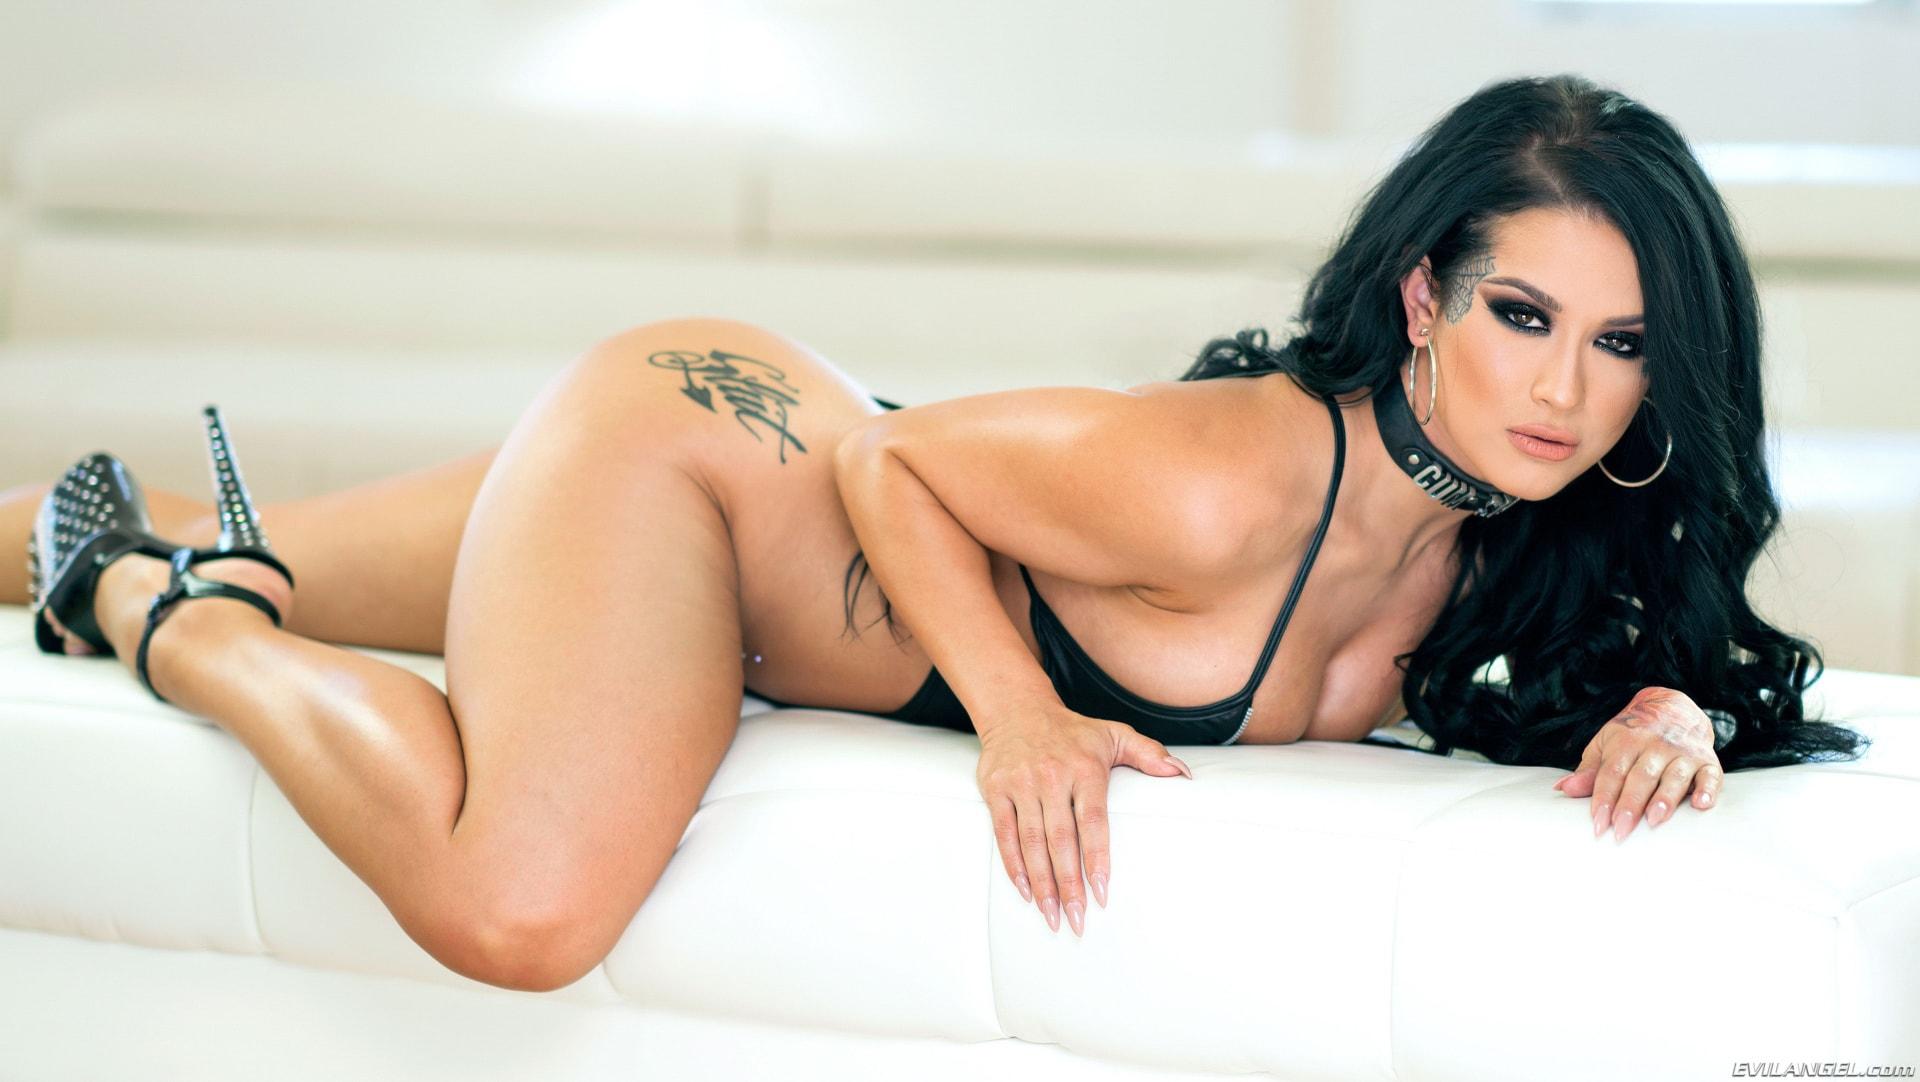 Evil Angel 'Creampie Compilation - Jonni Darkko' starring Britney Amber (Photo 70)